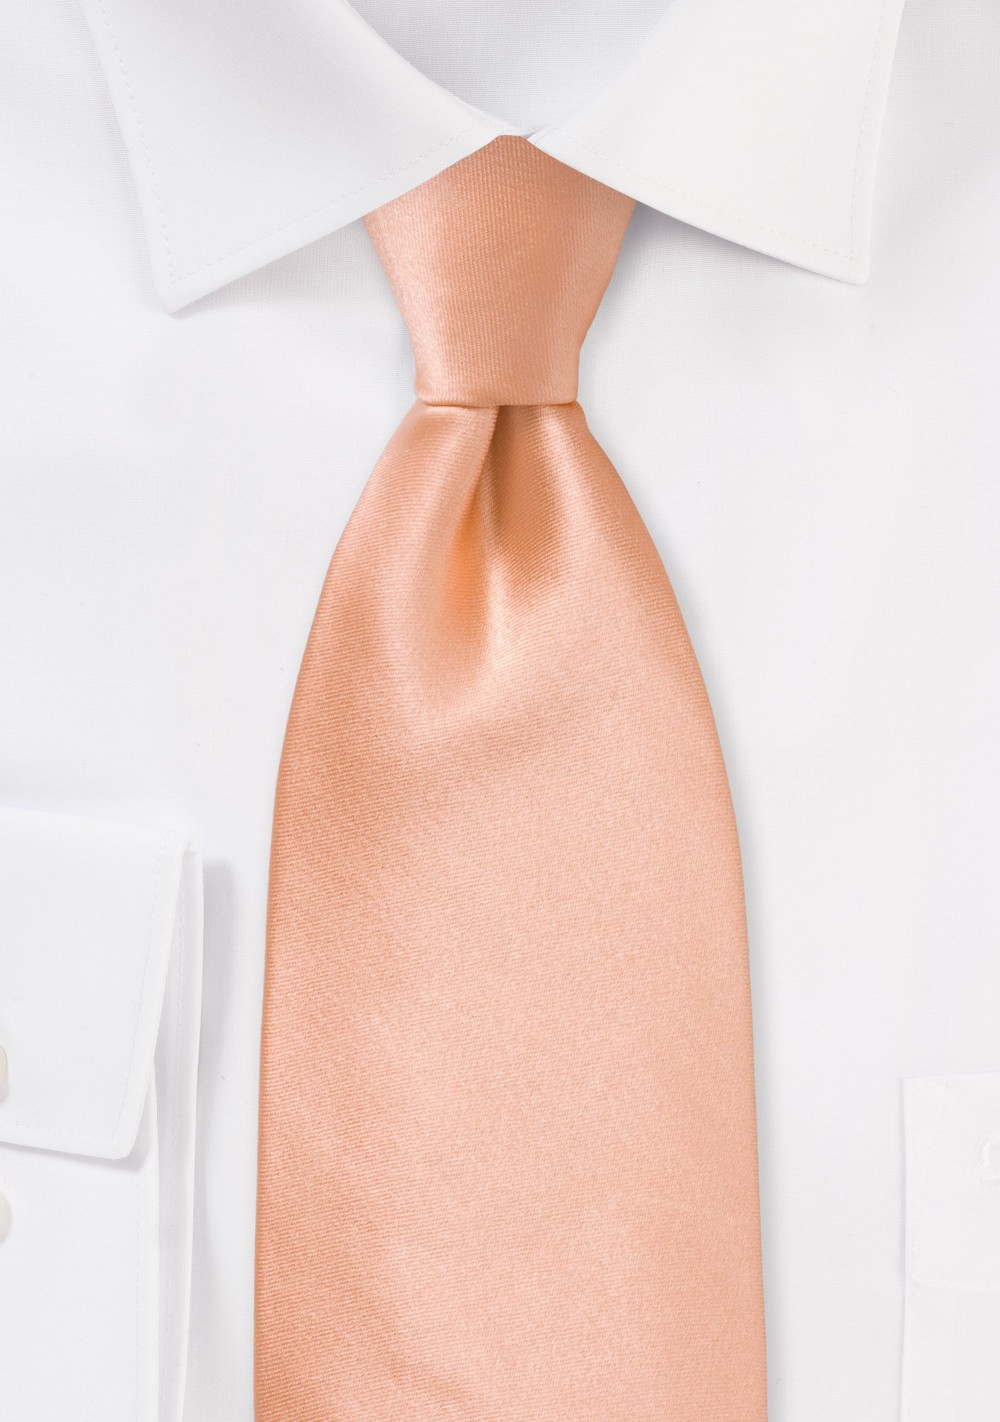 XL Tie in Coral Peach